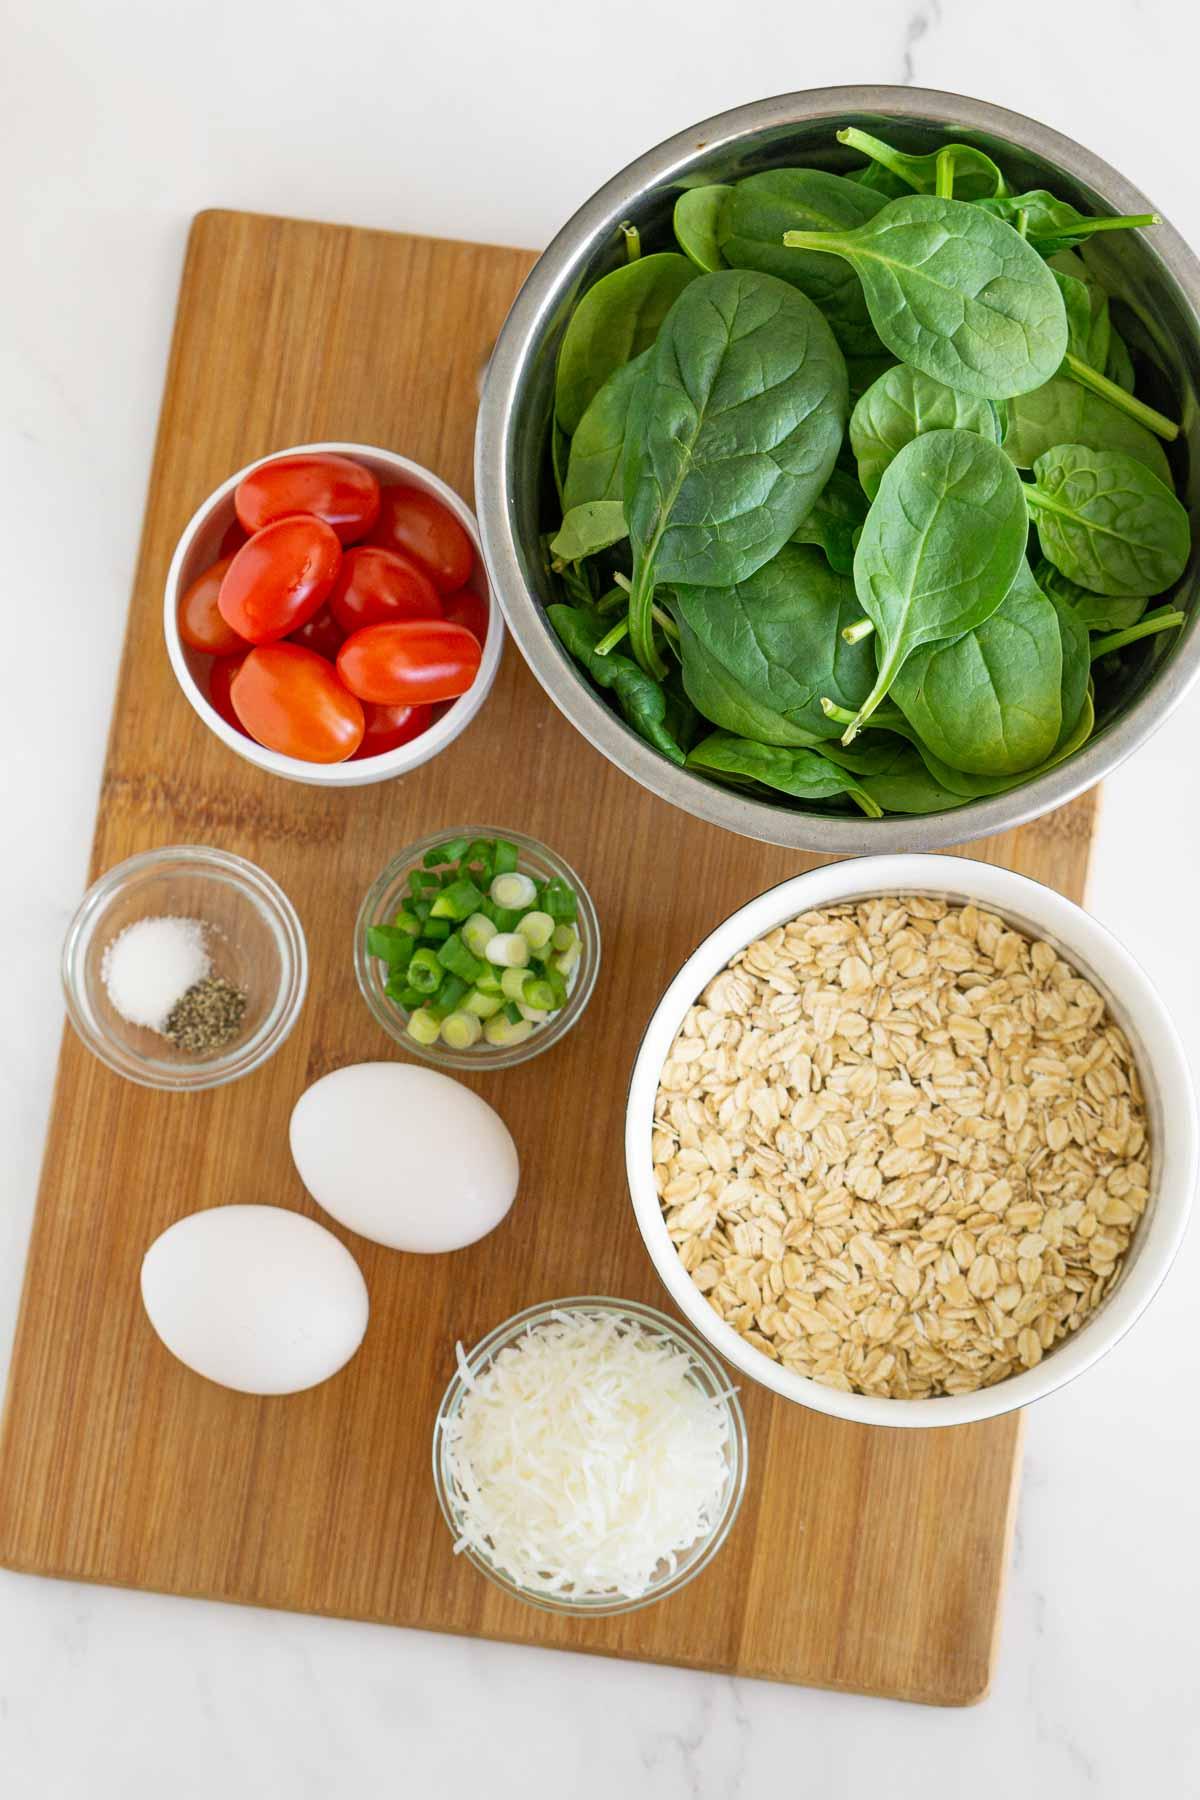 Ingredients to make savory oatmeal.